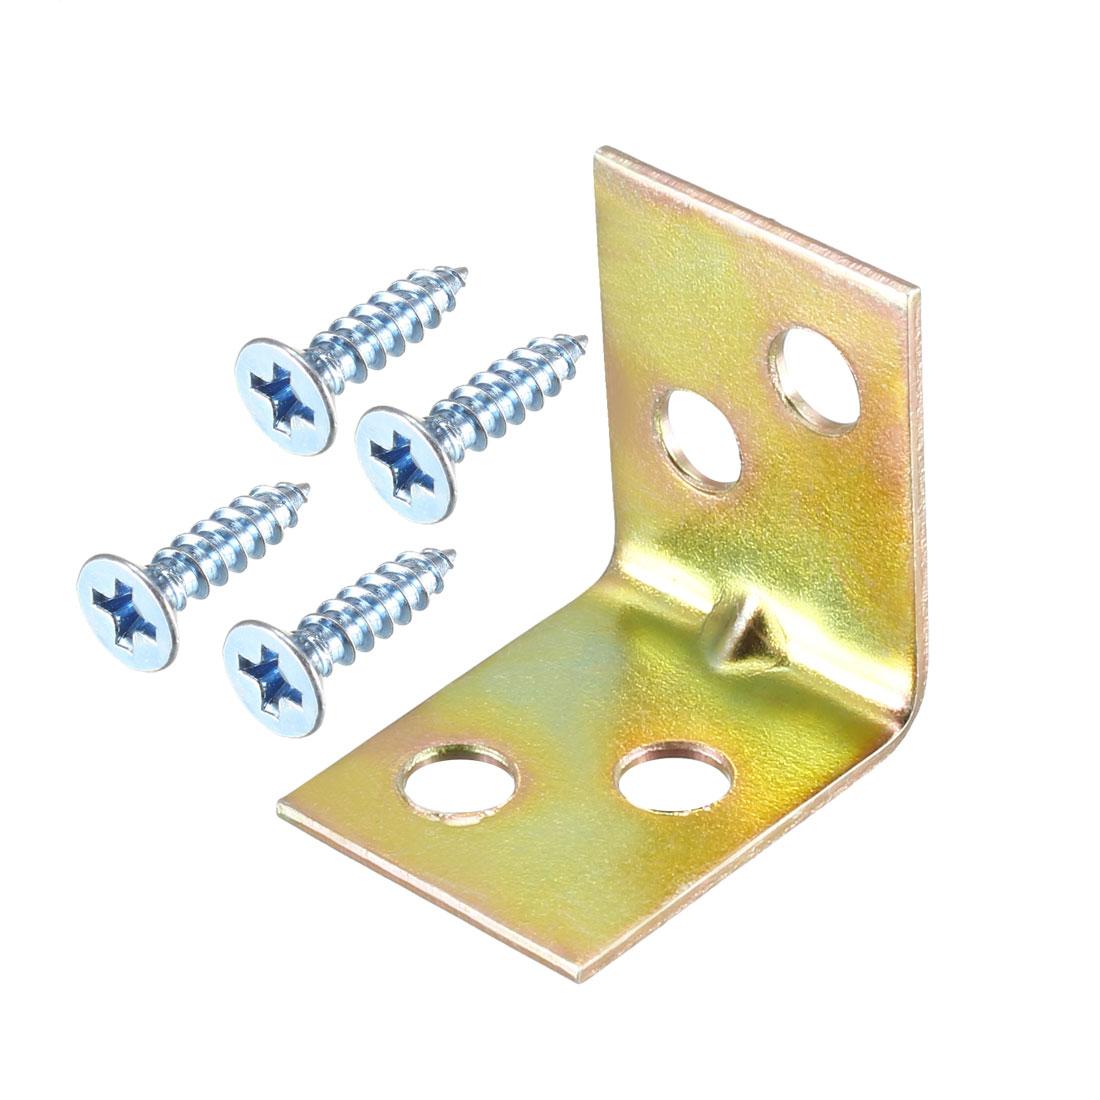 Corner Brace, 22mm x 22mm Zinc Plated Joint Right Angle Bracket w Screws, 20 Pcs